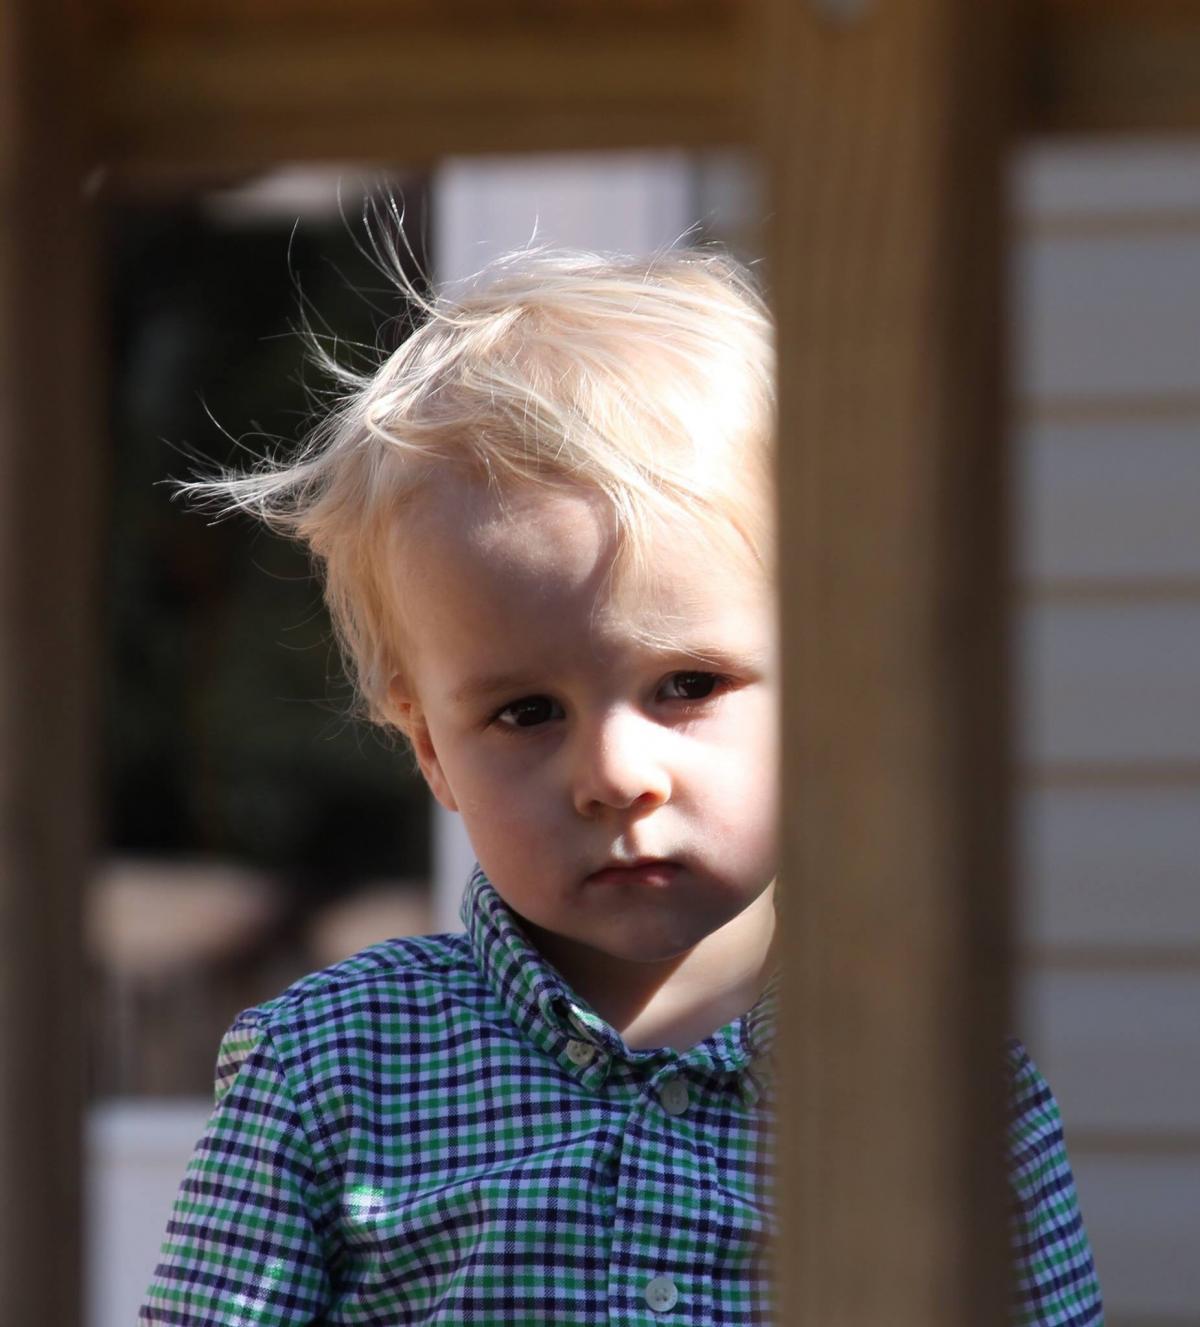 Child Cute Kid